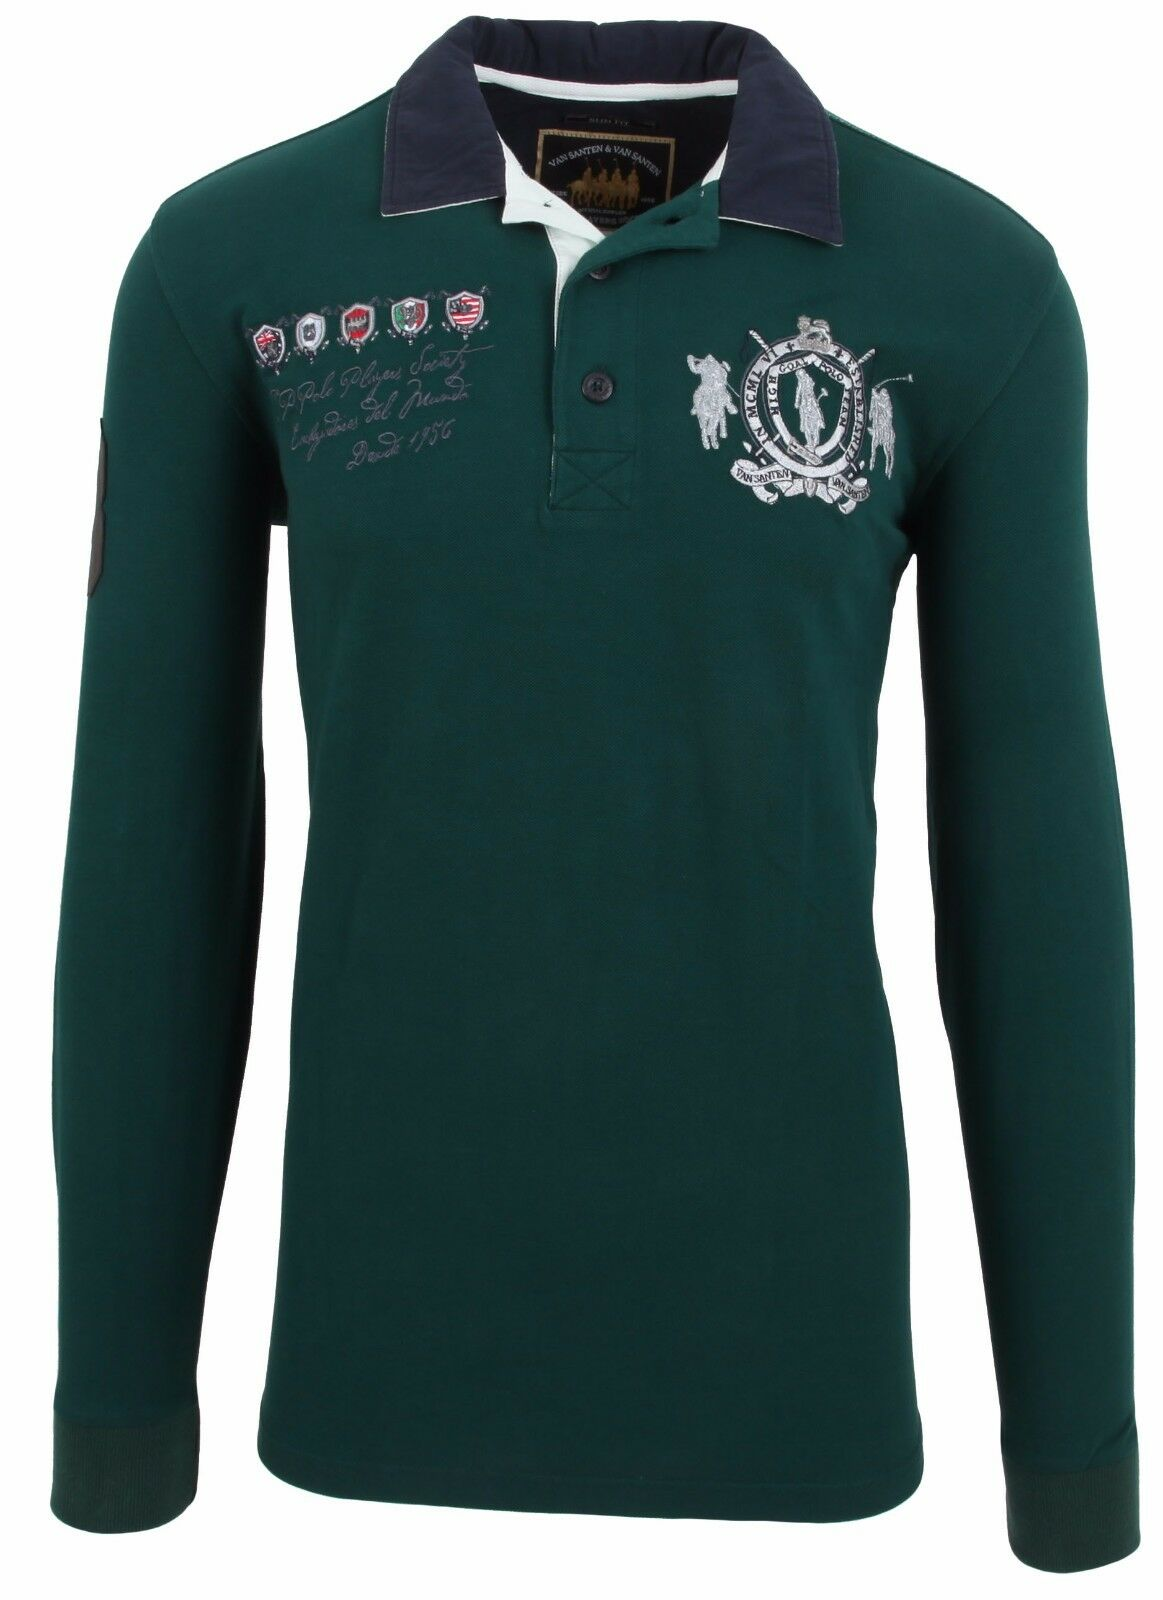 VAN SANTEN & VAN SANTEN Sweatshirt Shirt Polo Größe L Baumwolle & Leder Grün NEU